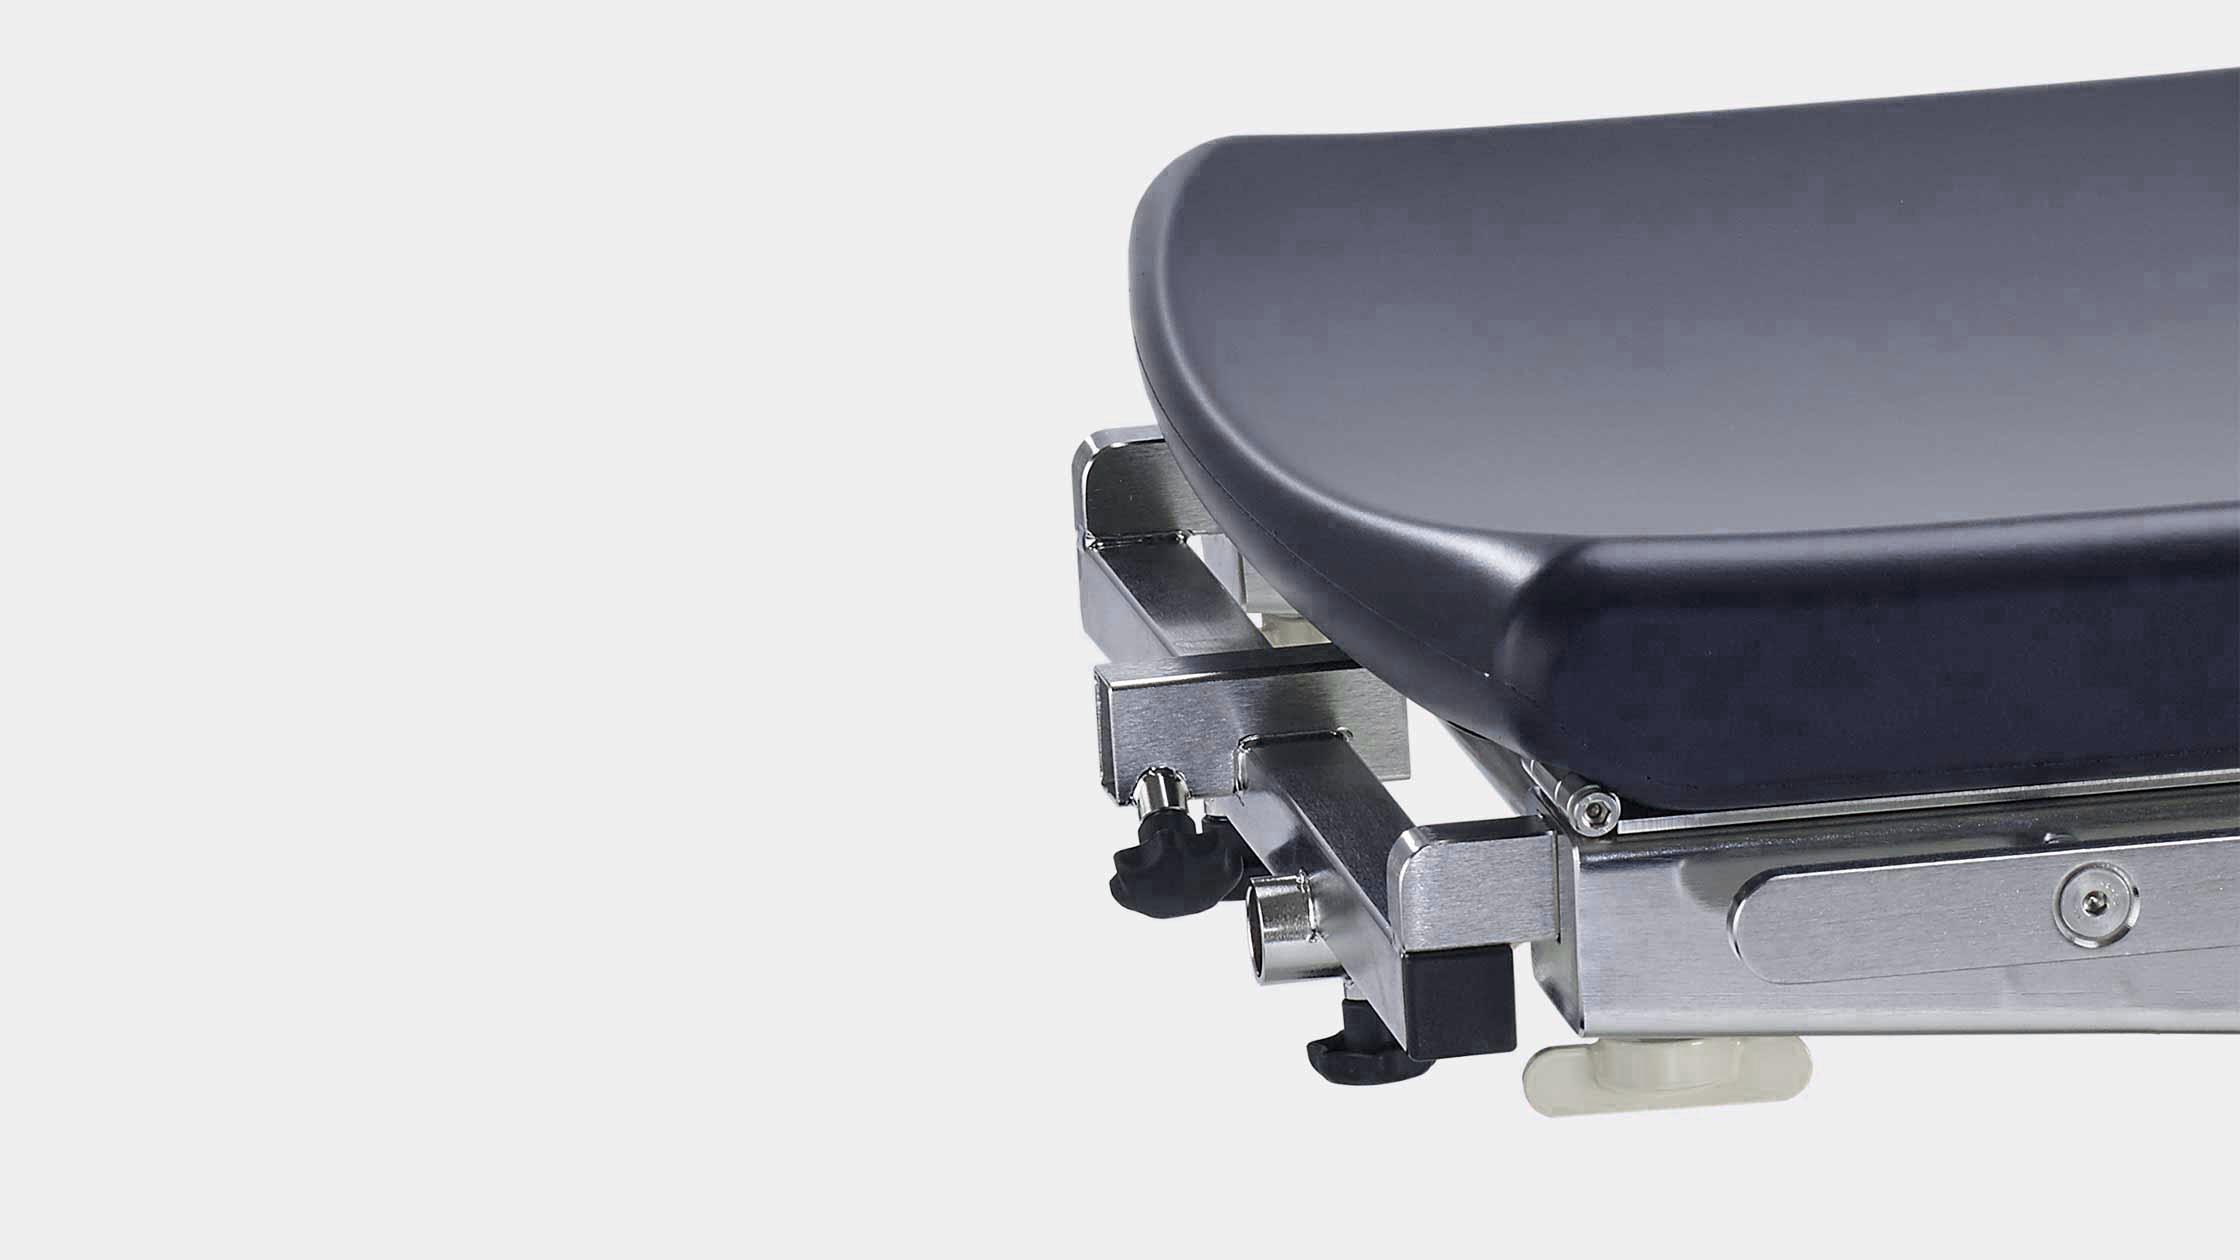 universaladapter fuer medifa 5000 und 6000